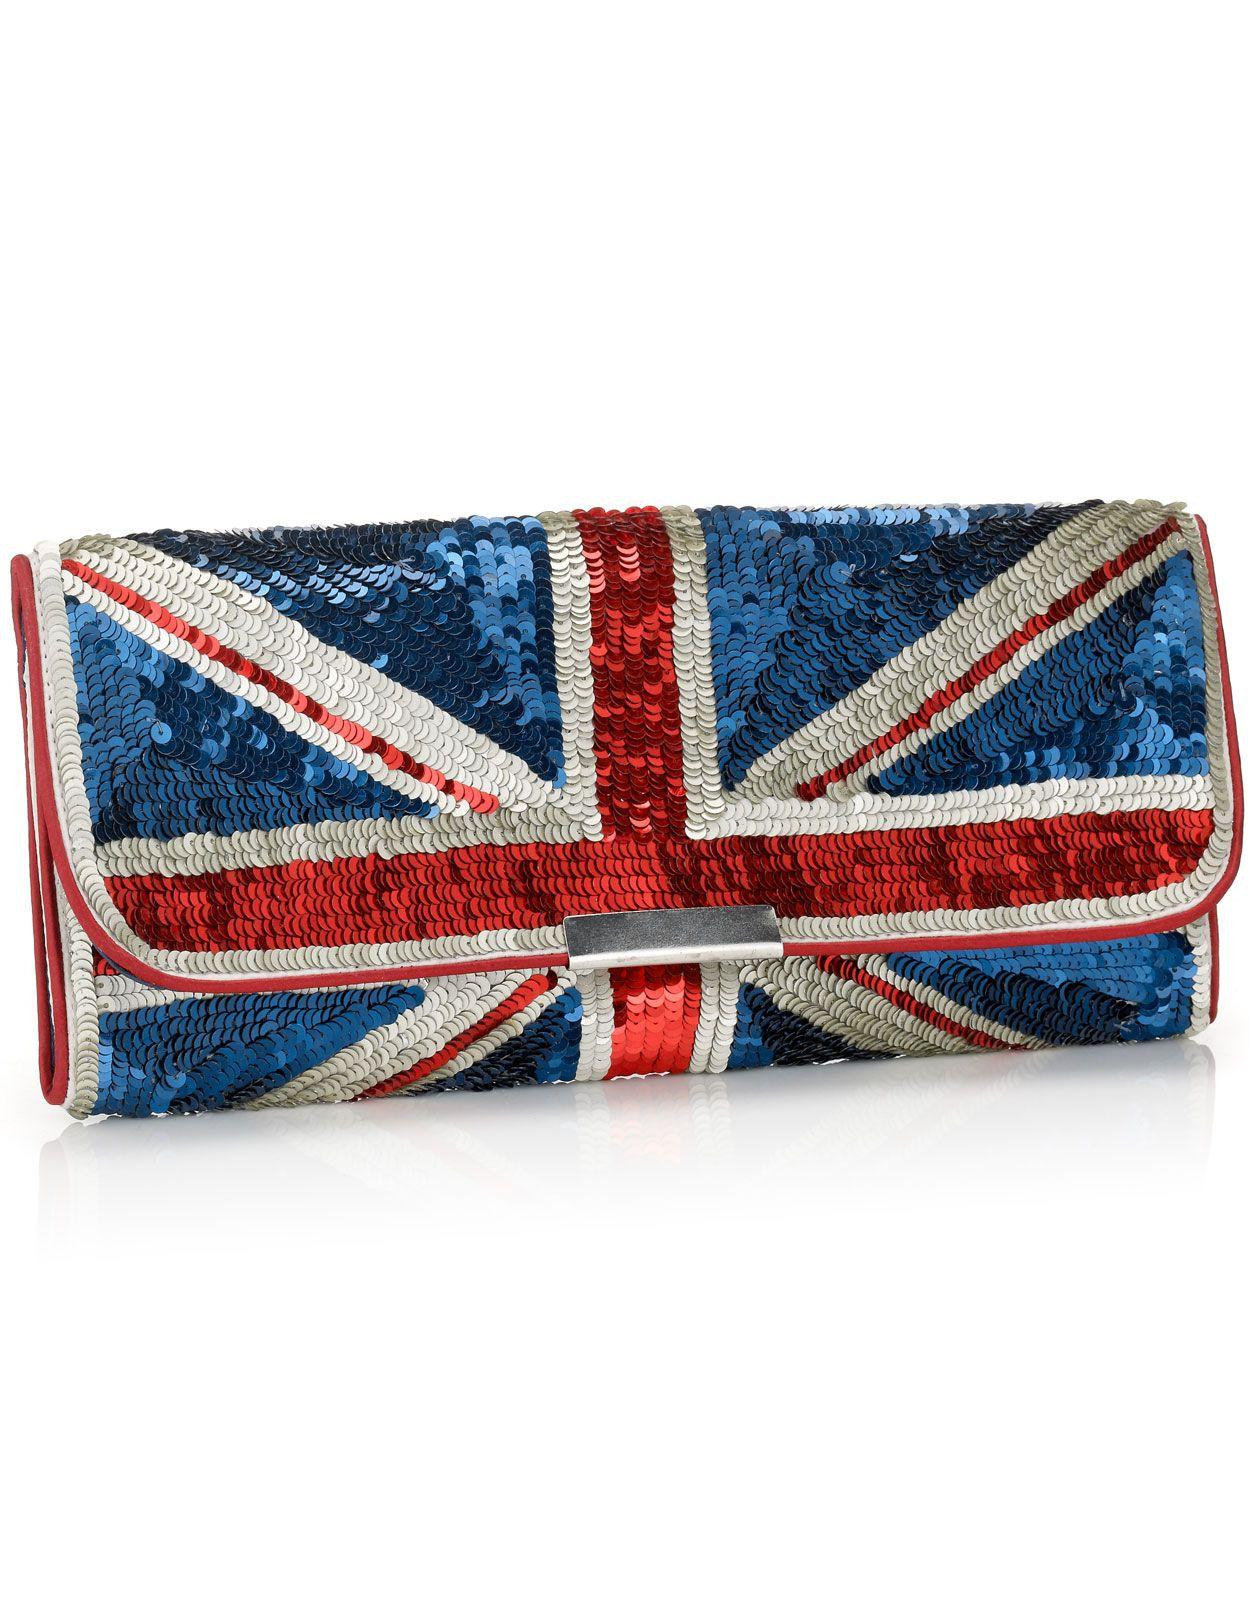 823165311e Union Jack Sequin Clutch | Accessorize | Weddings | Clutch bag ...